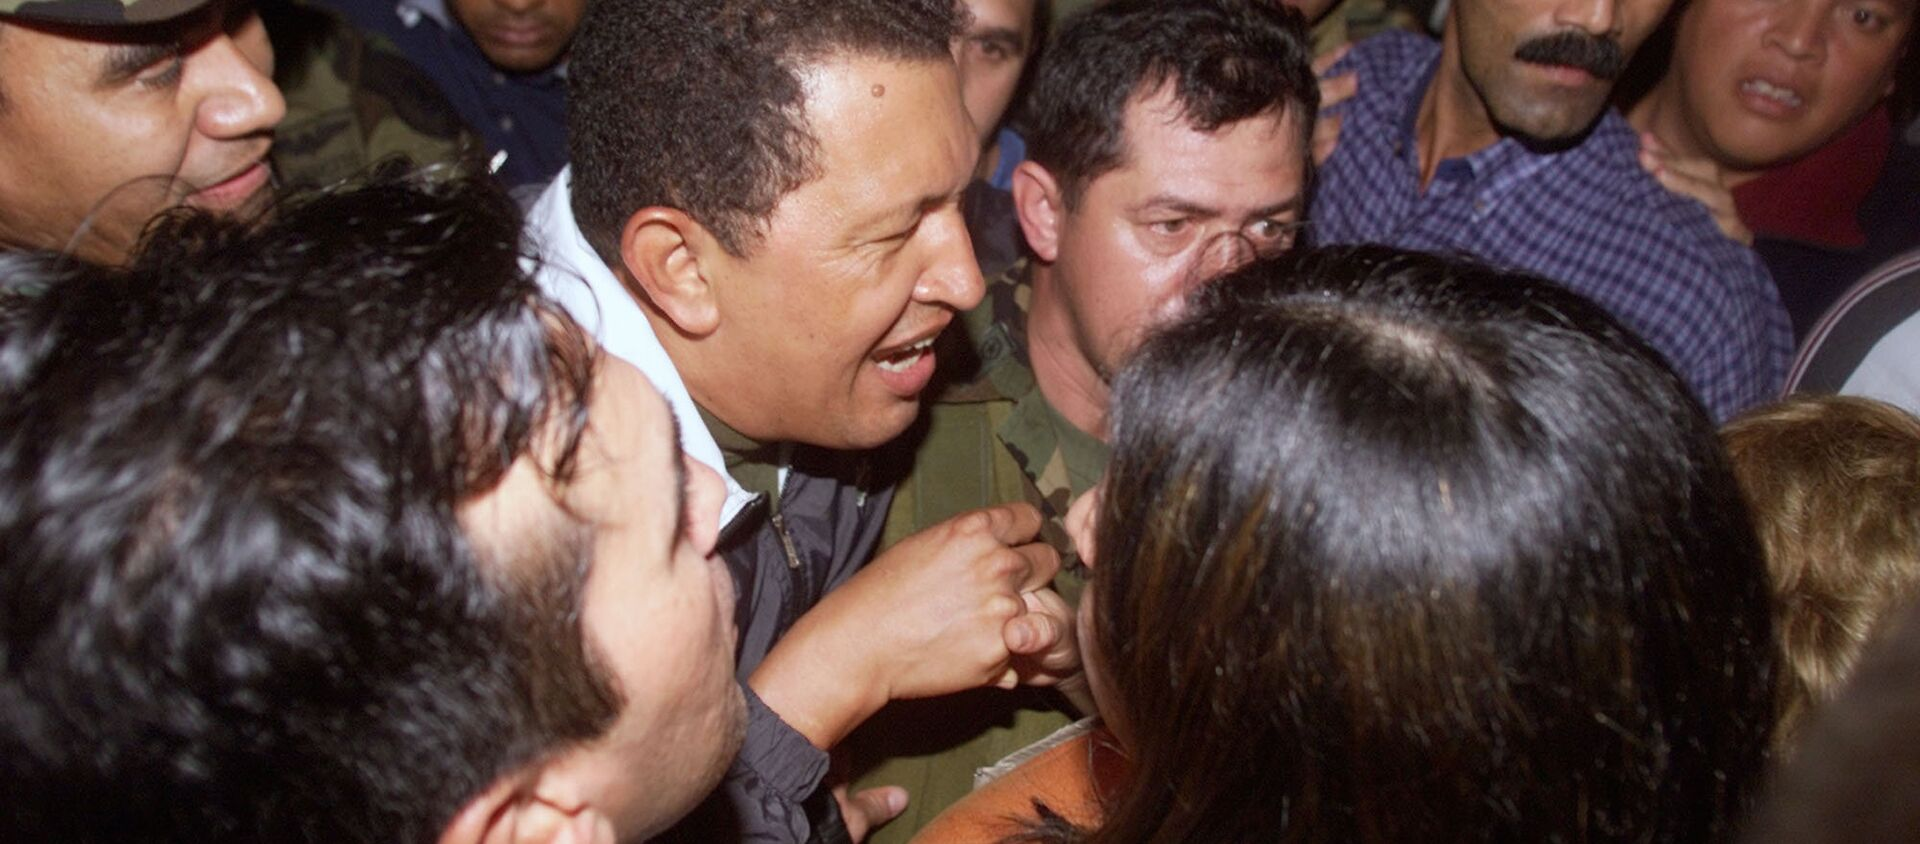 Hugo Chávez vuelve al palacio de Miraflores, 14 de abril de 2002 - Sputnik Mundo, 1920, 27.01.2019